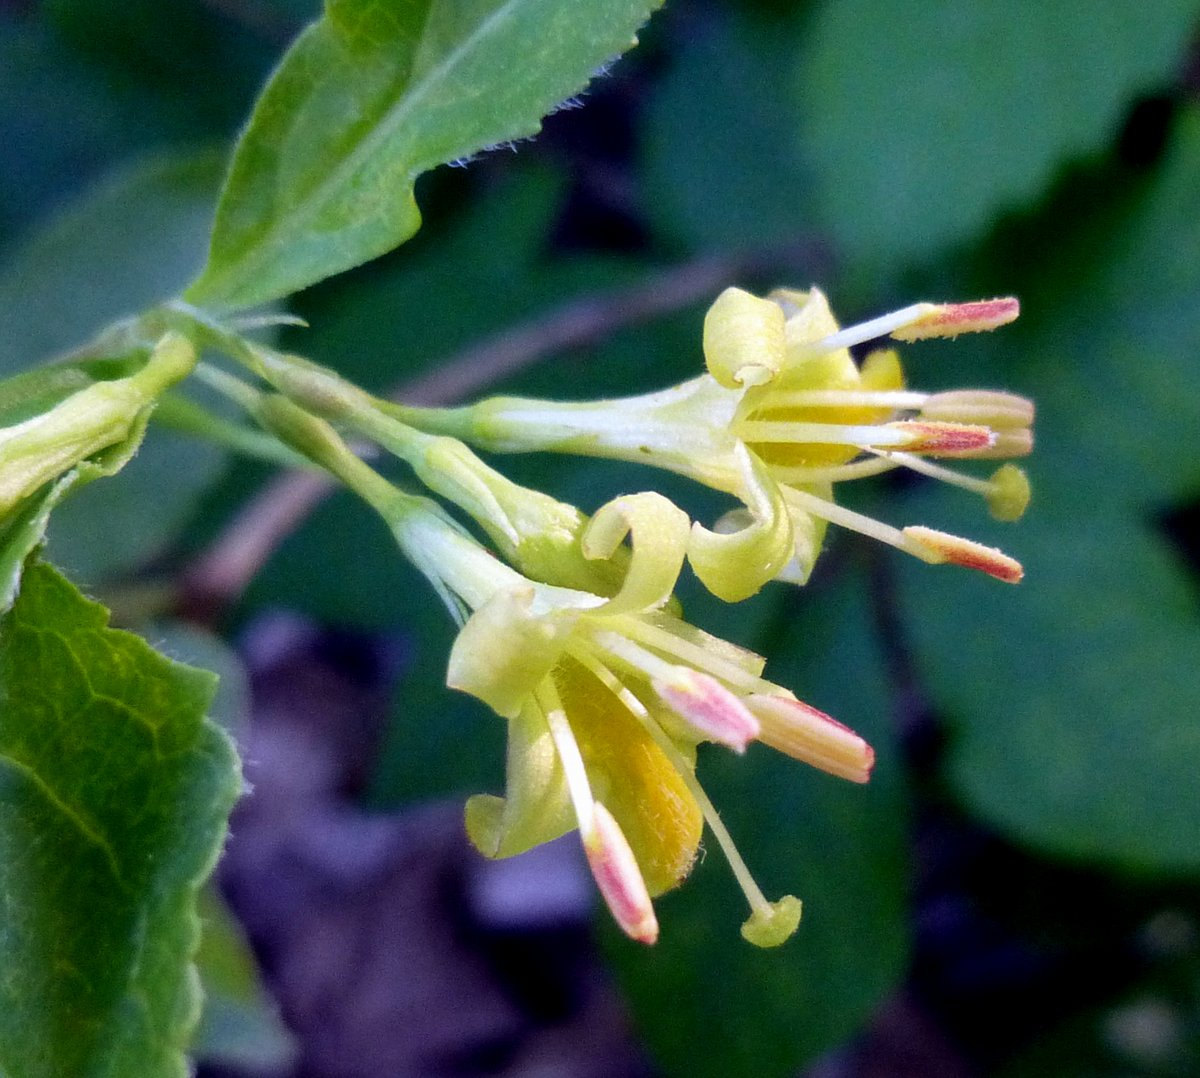 2. Bush Honeysuckle